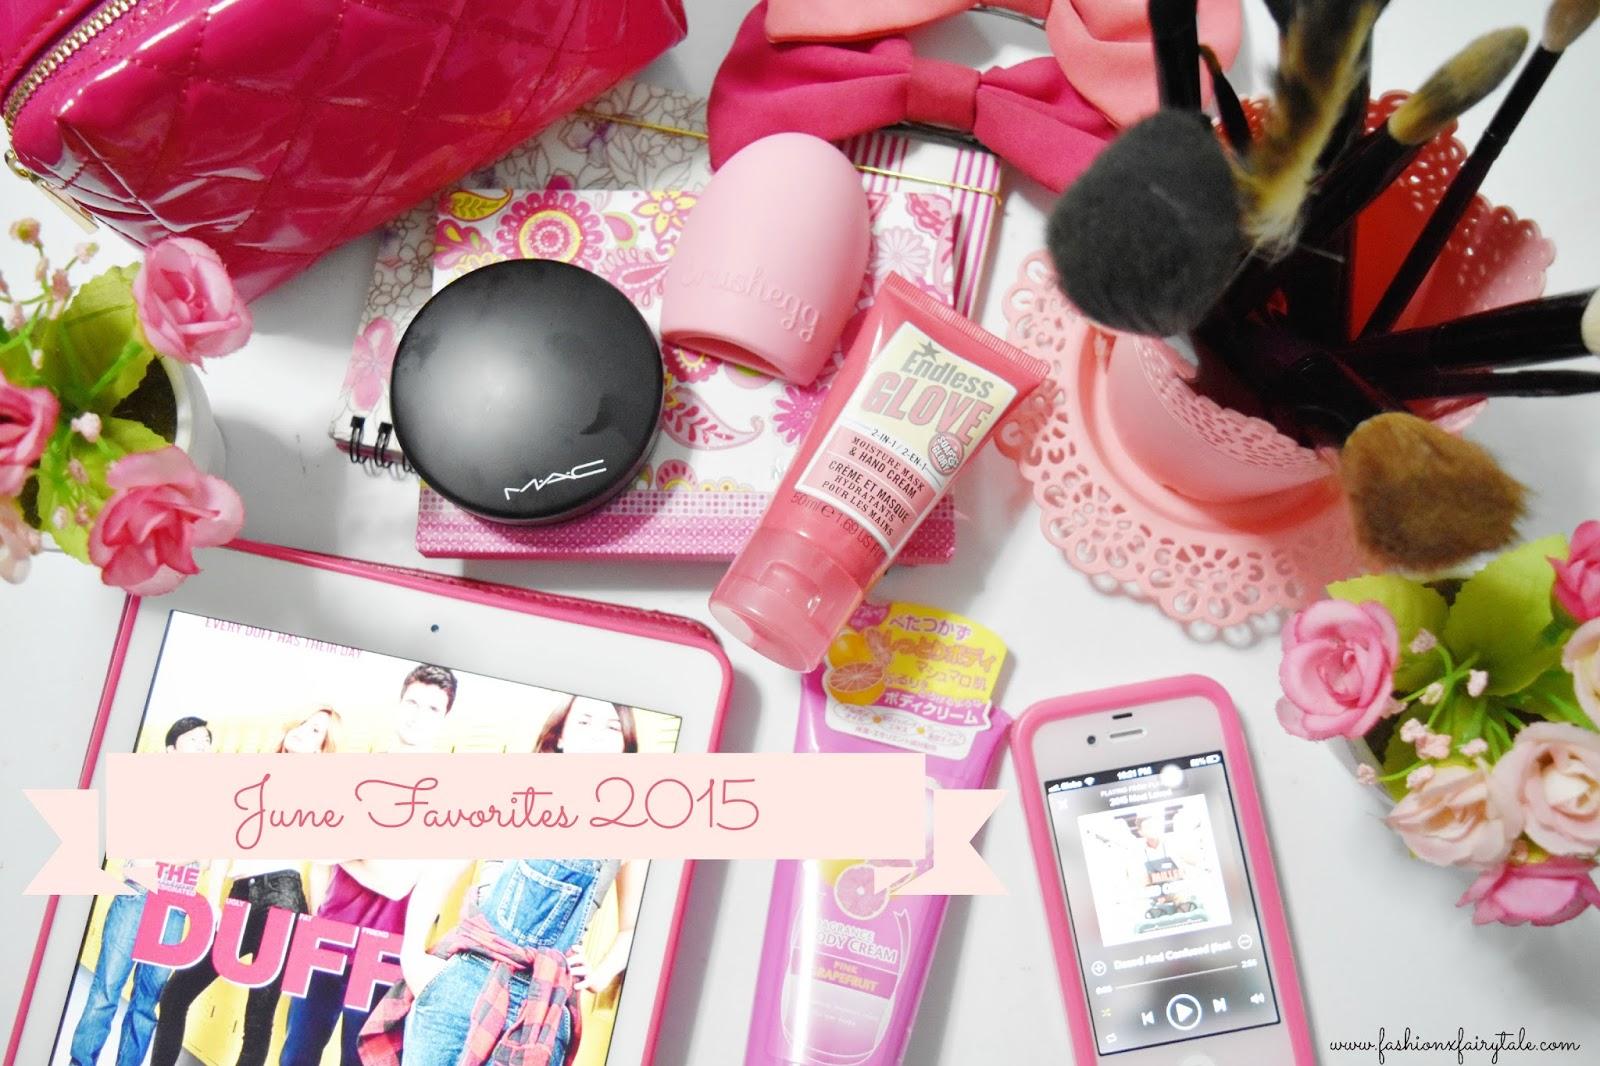 June Favorites 2015 | Beauty & Lifestyle